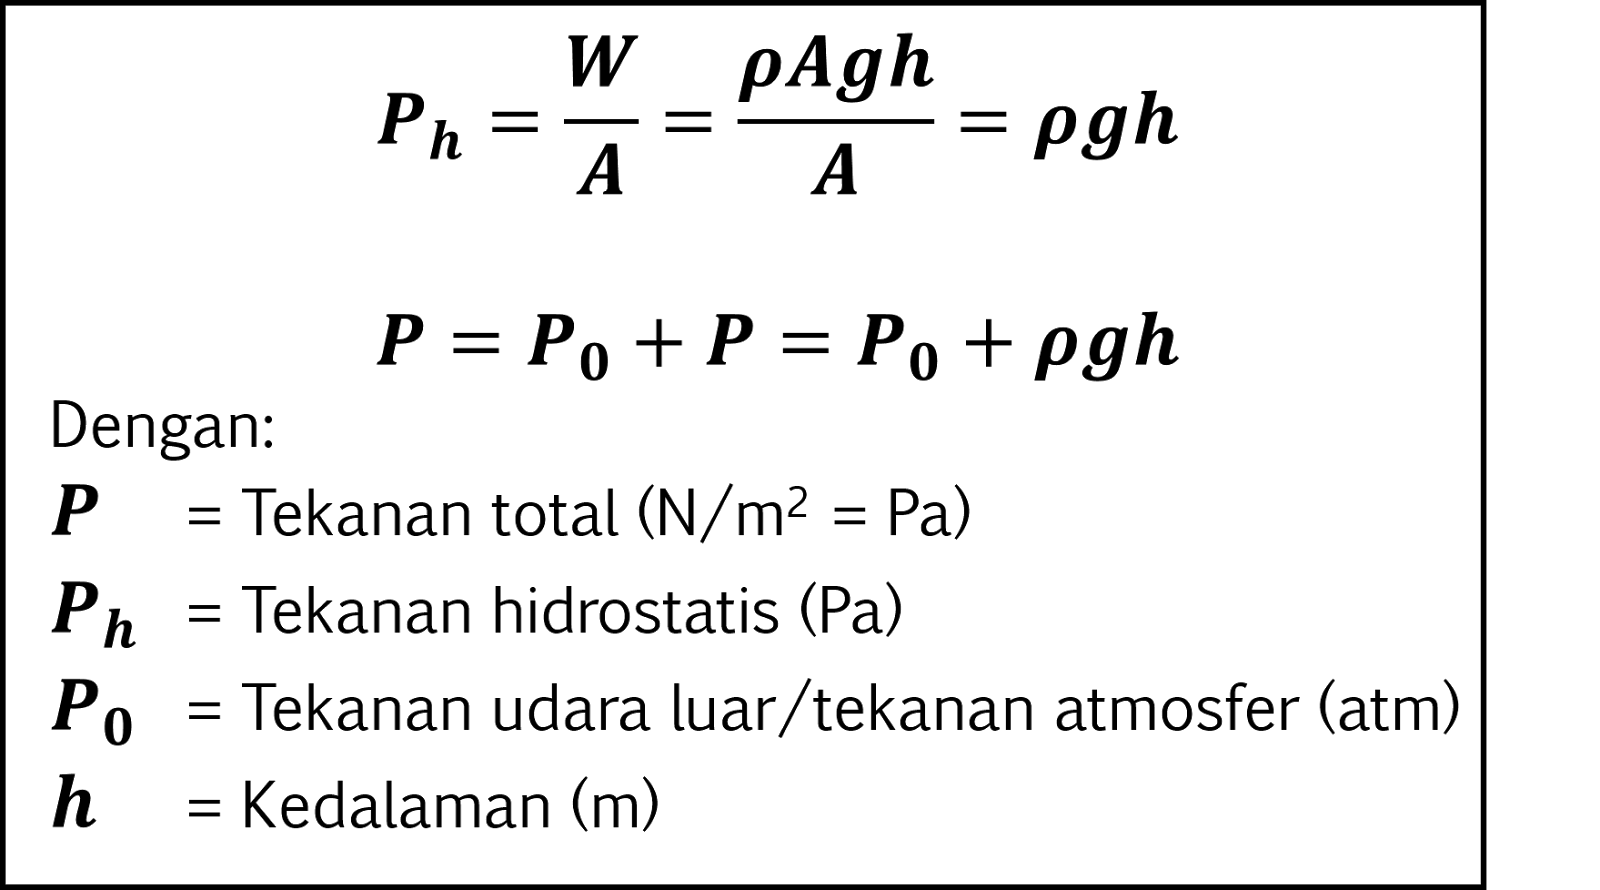 Tekanan%2BHidrostatis - Rumus Mencari Massa Jenis Zat Cair